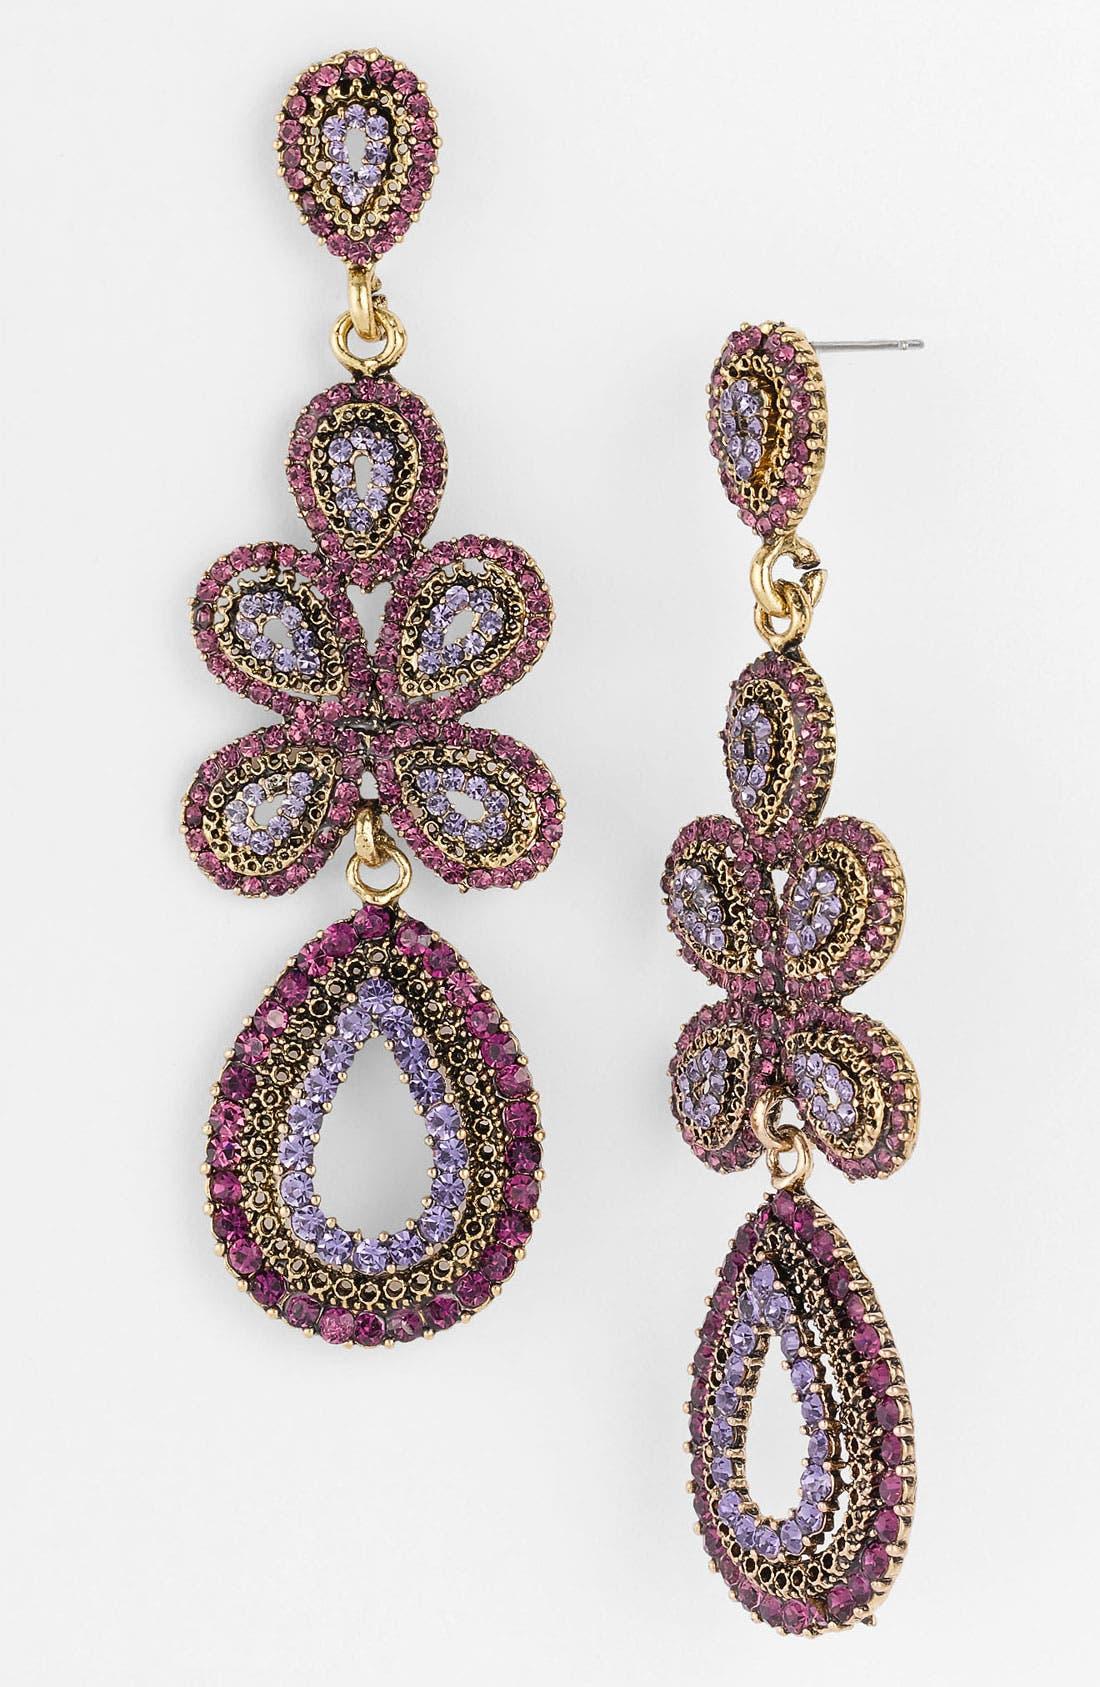 'Ornate' Linear Statement Earrings,                             Main thumbnail 12, color,